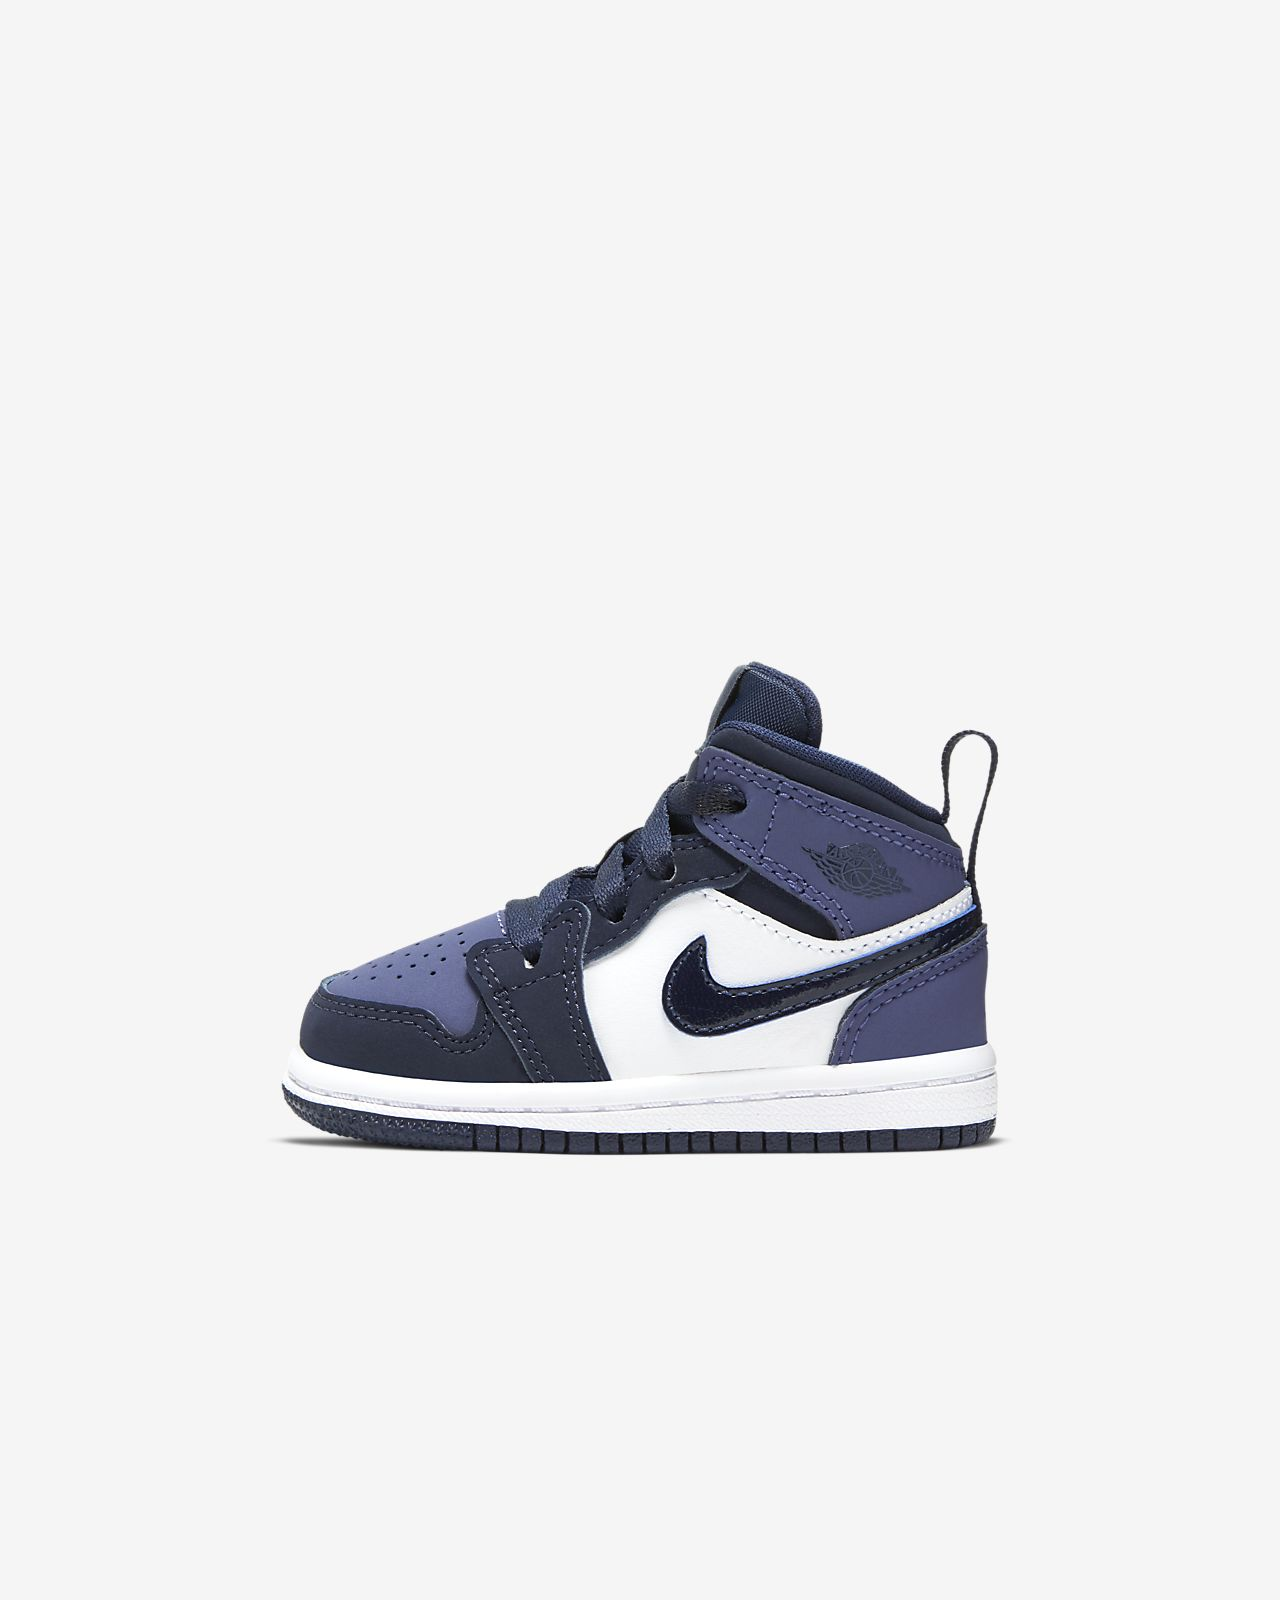 Air Jordan 1 Mid Infant/Toddler Shoe